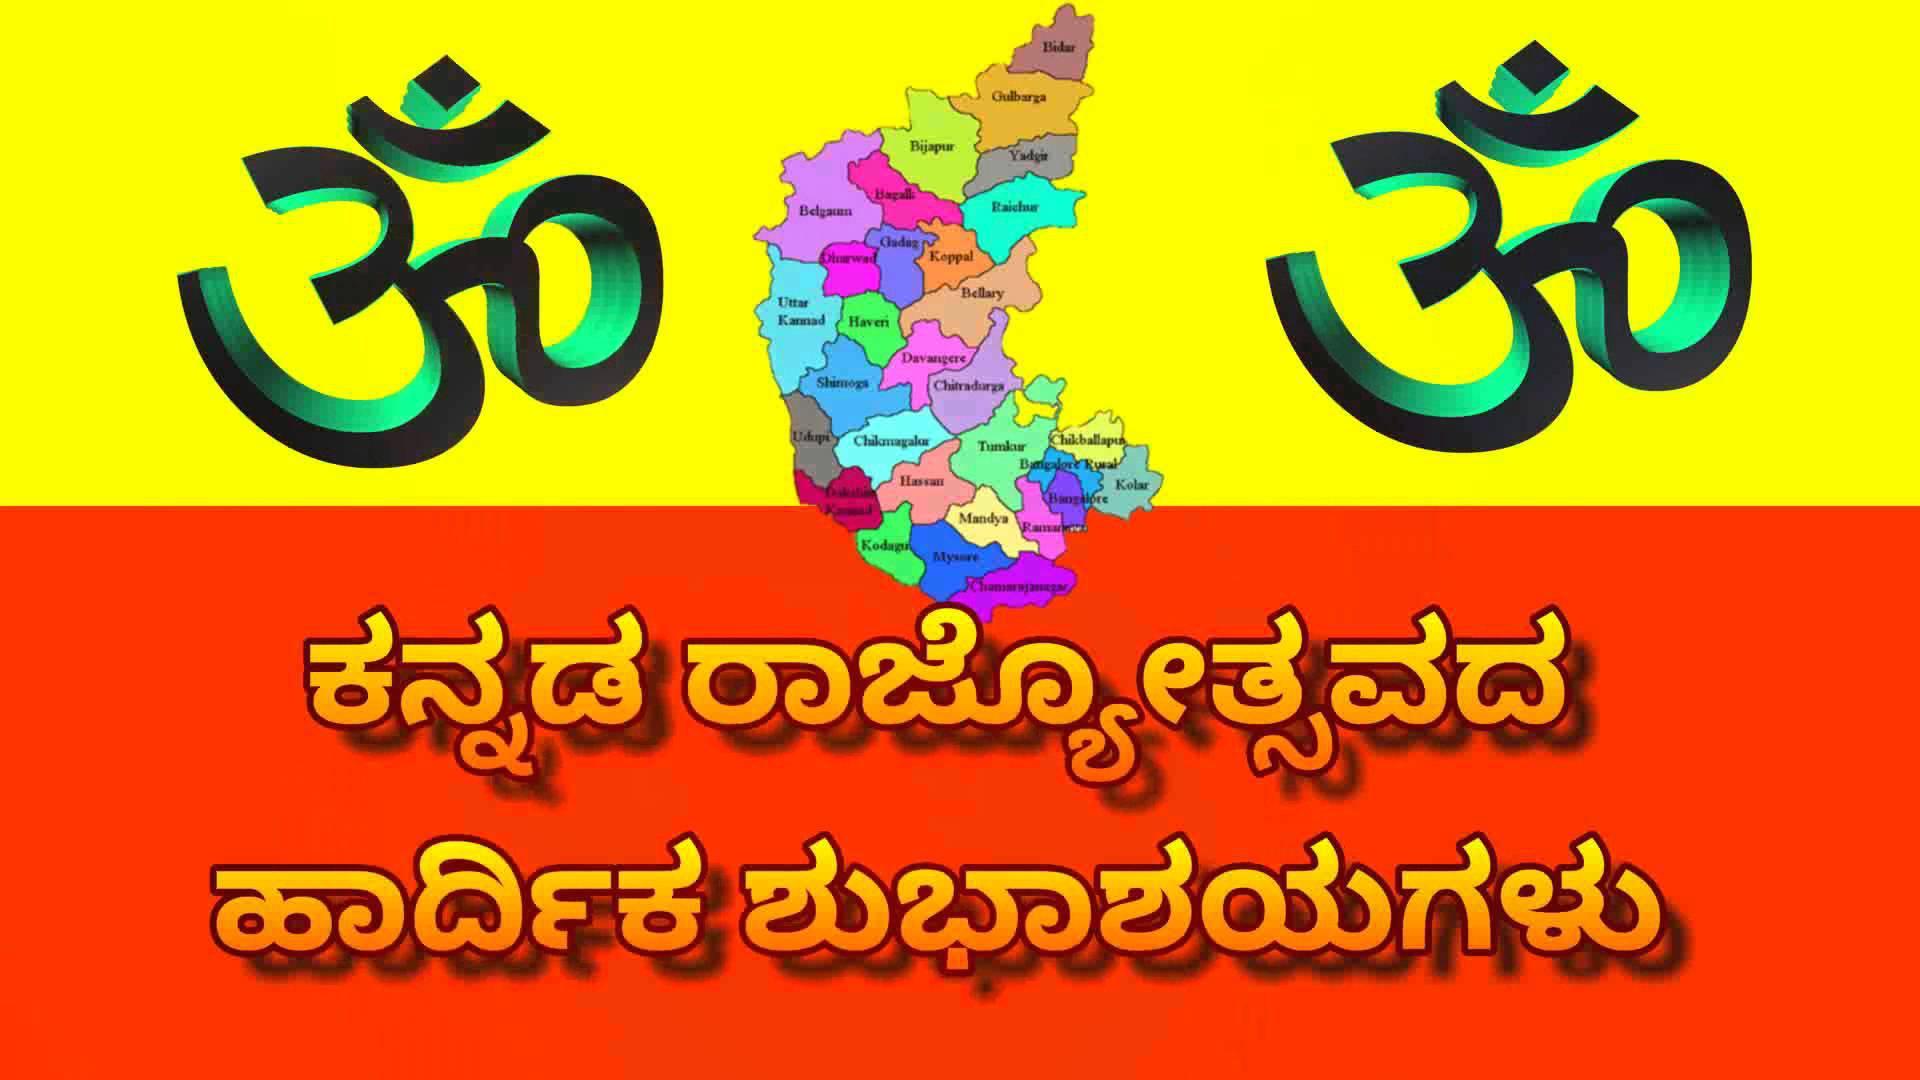 karnataka rajyotsava 1139470 hd wallpaper backgrounds download karnataka rajyotsava 1139470 hd